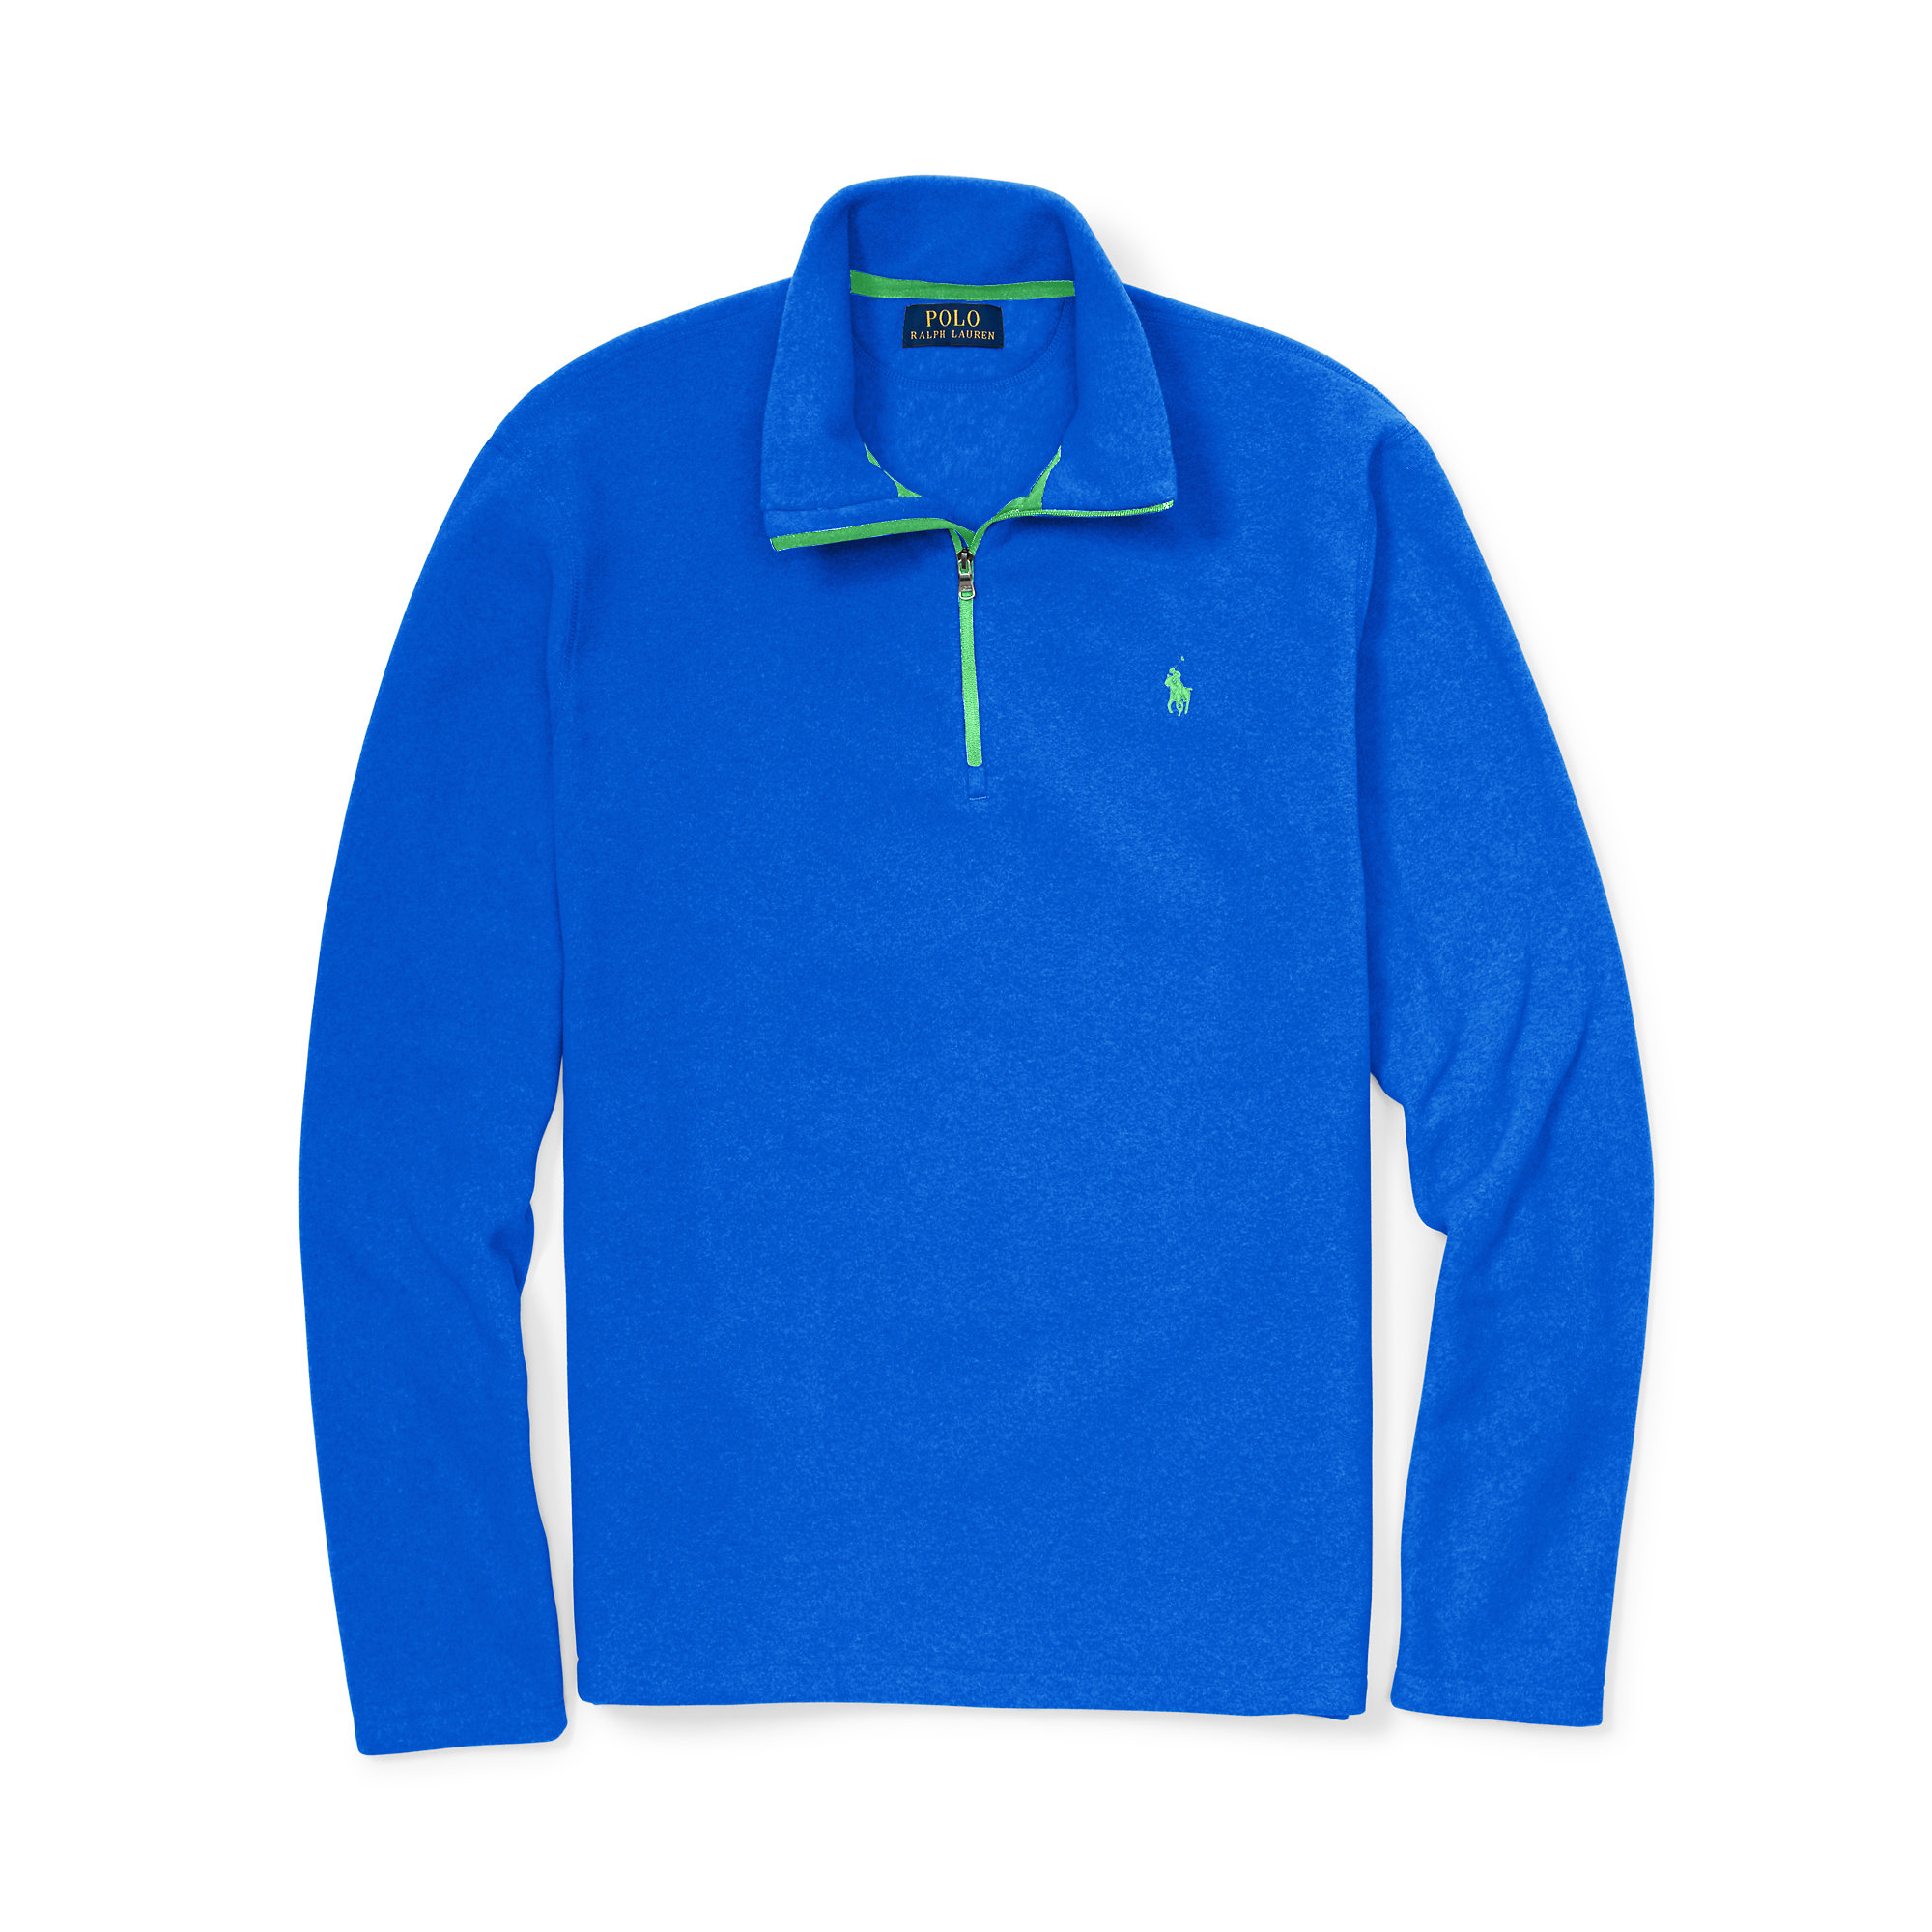 polo ralph lauren blue microfleece half zip pullover for men lyst. Black Bedroom Furniture Sets. Home Design Ideas